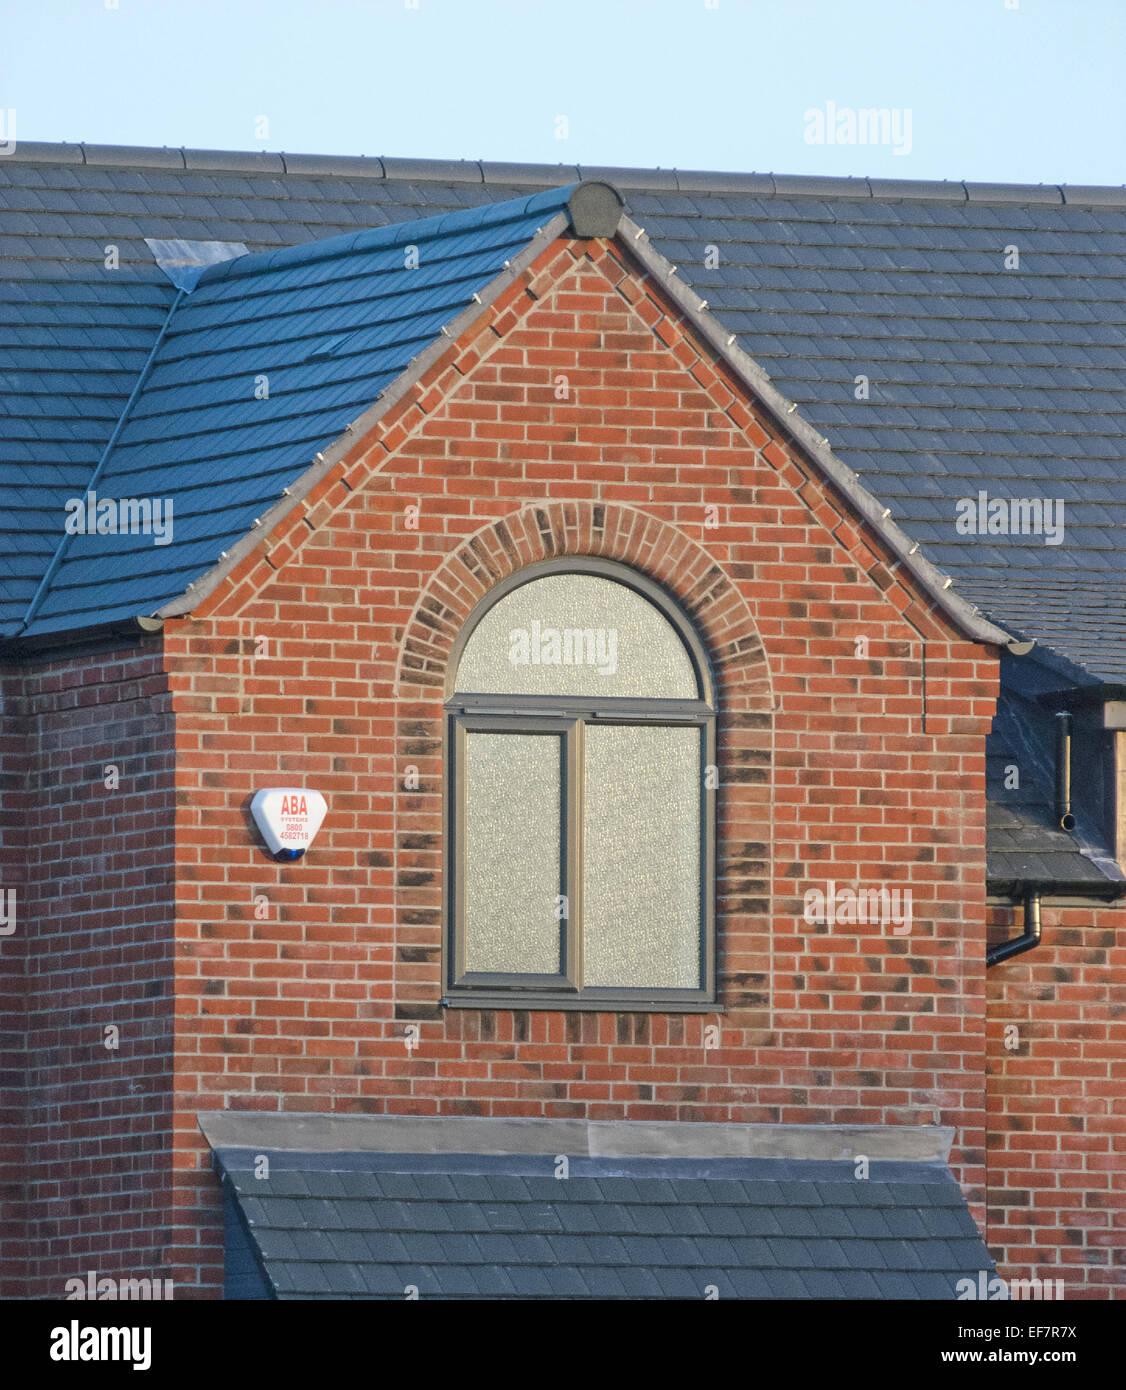 Half Moon Window on a New Build House, UK - Stock Image